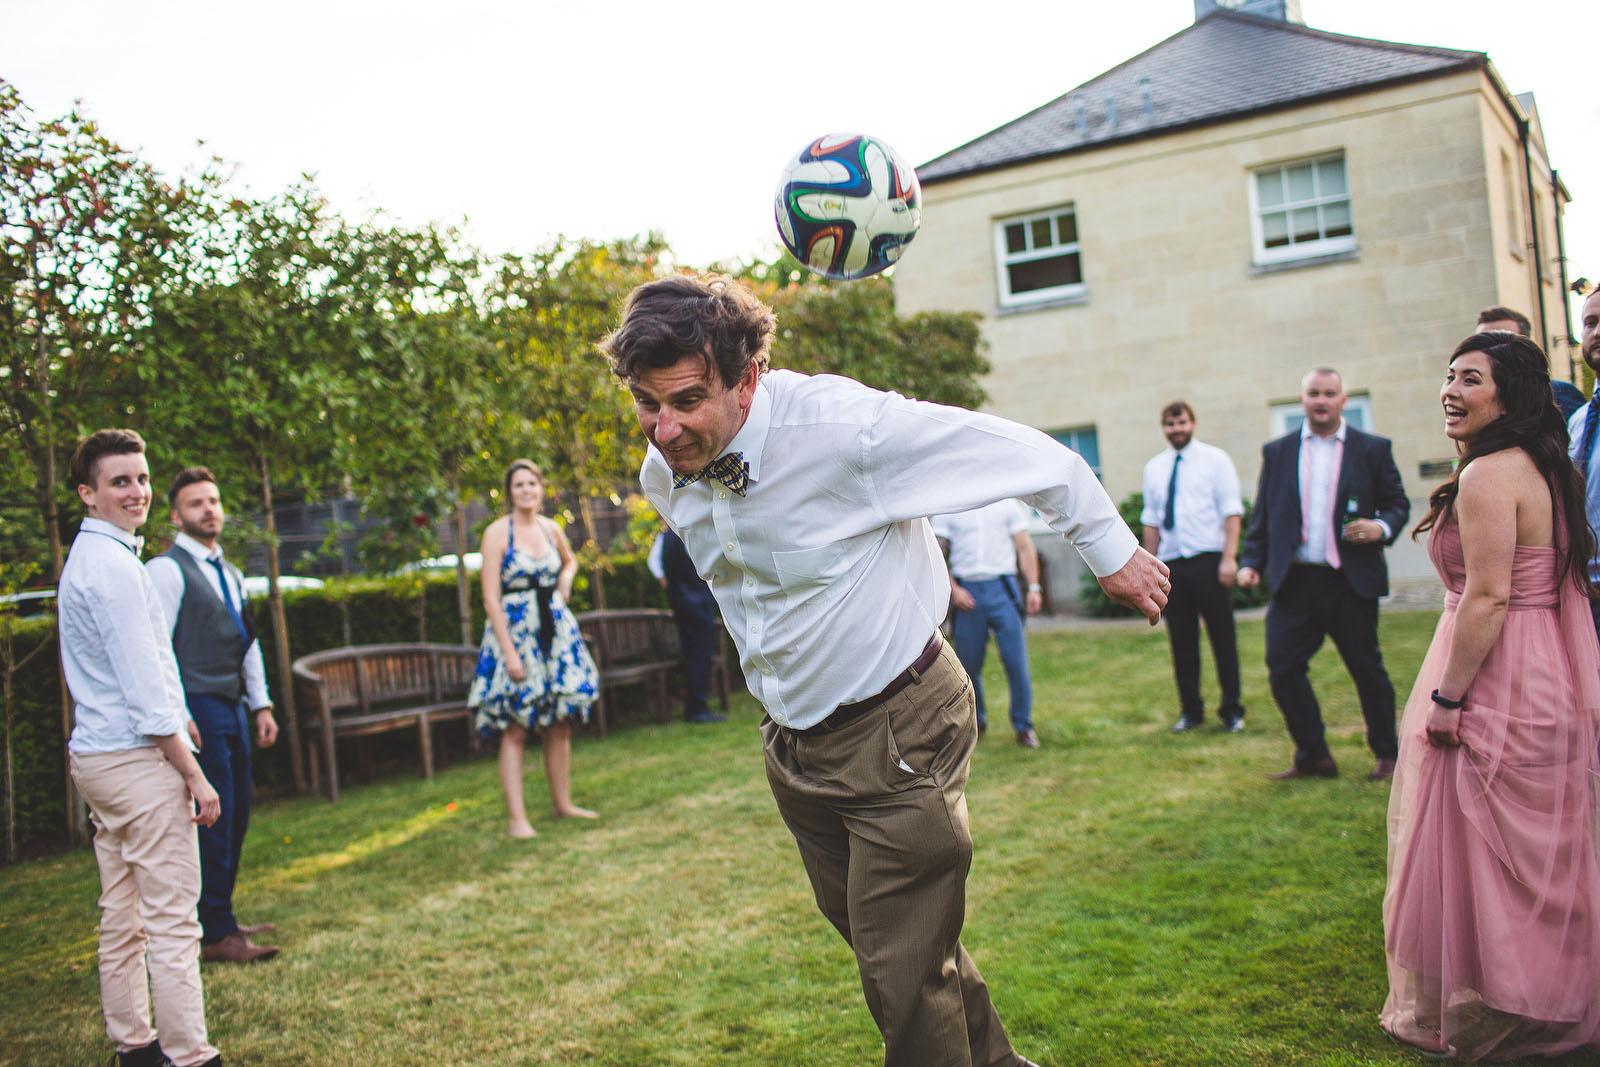 weddings at Botleys1